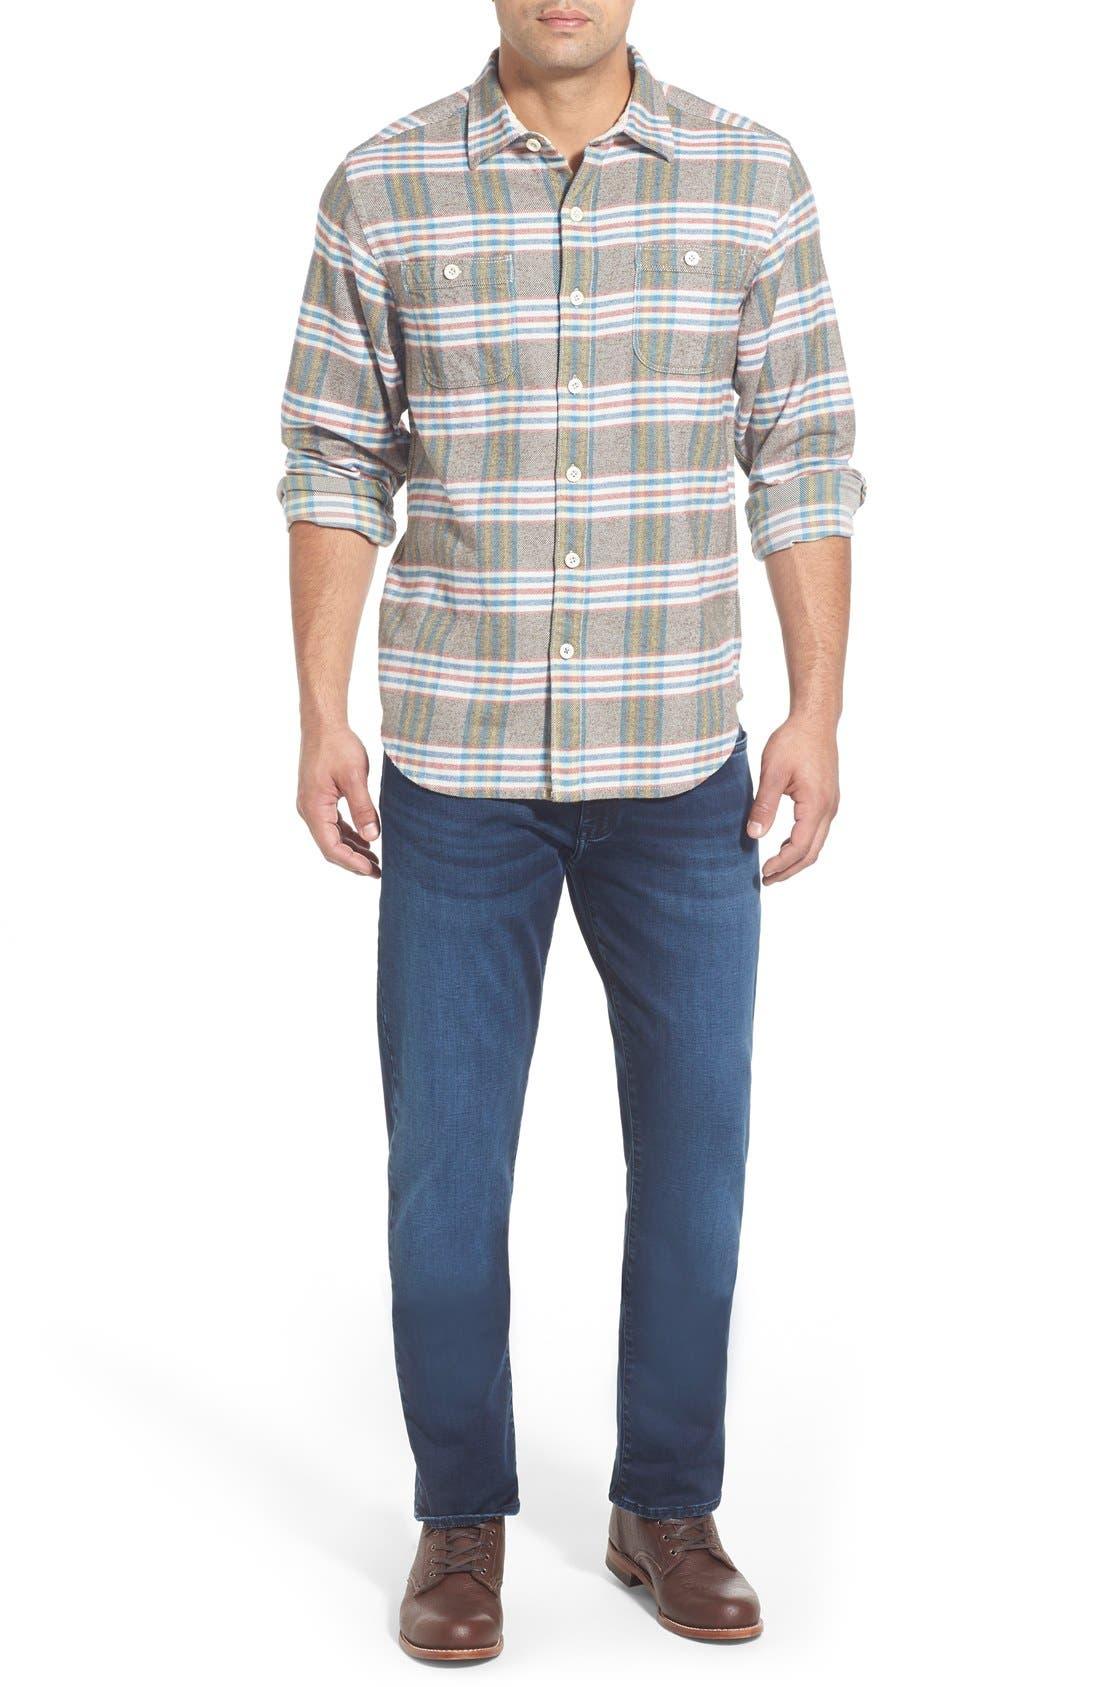 'Flannel Time' Original FitPlaid Flannel Shirt,                             Alternate thumbnail 2, color,                             200